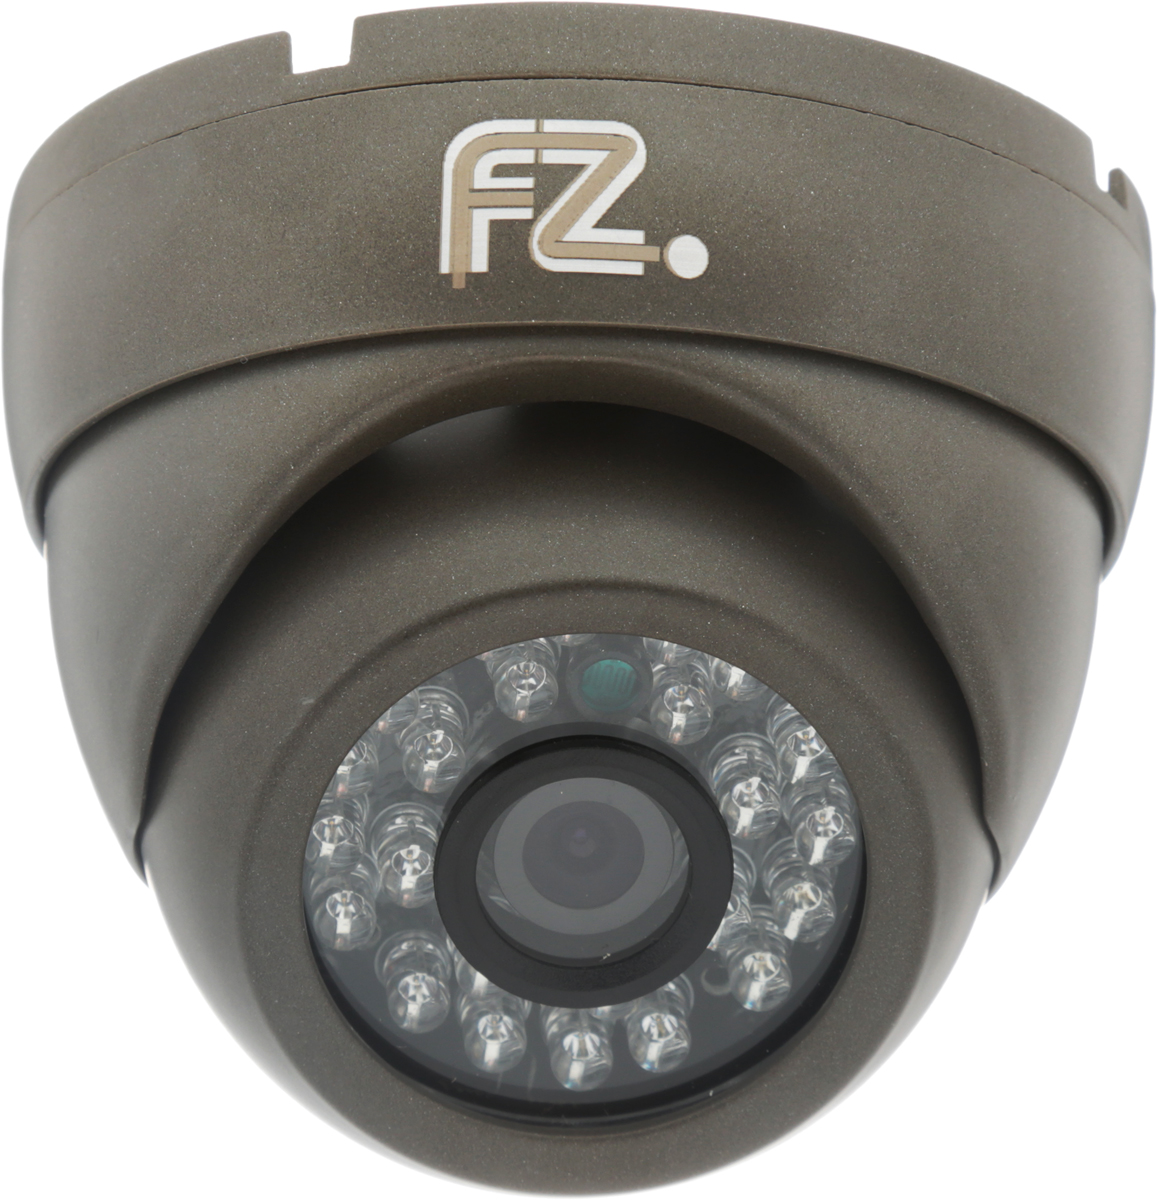 Fazera FZ-DIR24-720 камера видеонаблюдения fazera fz 04n01 сетевой видеорегистратор